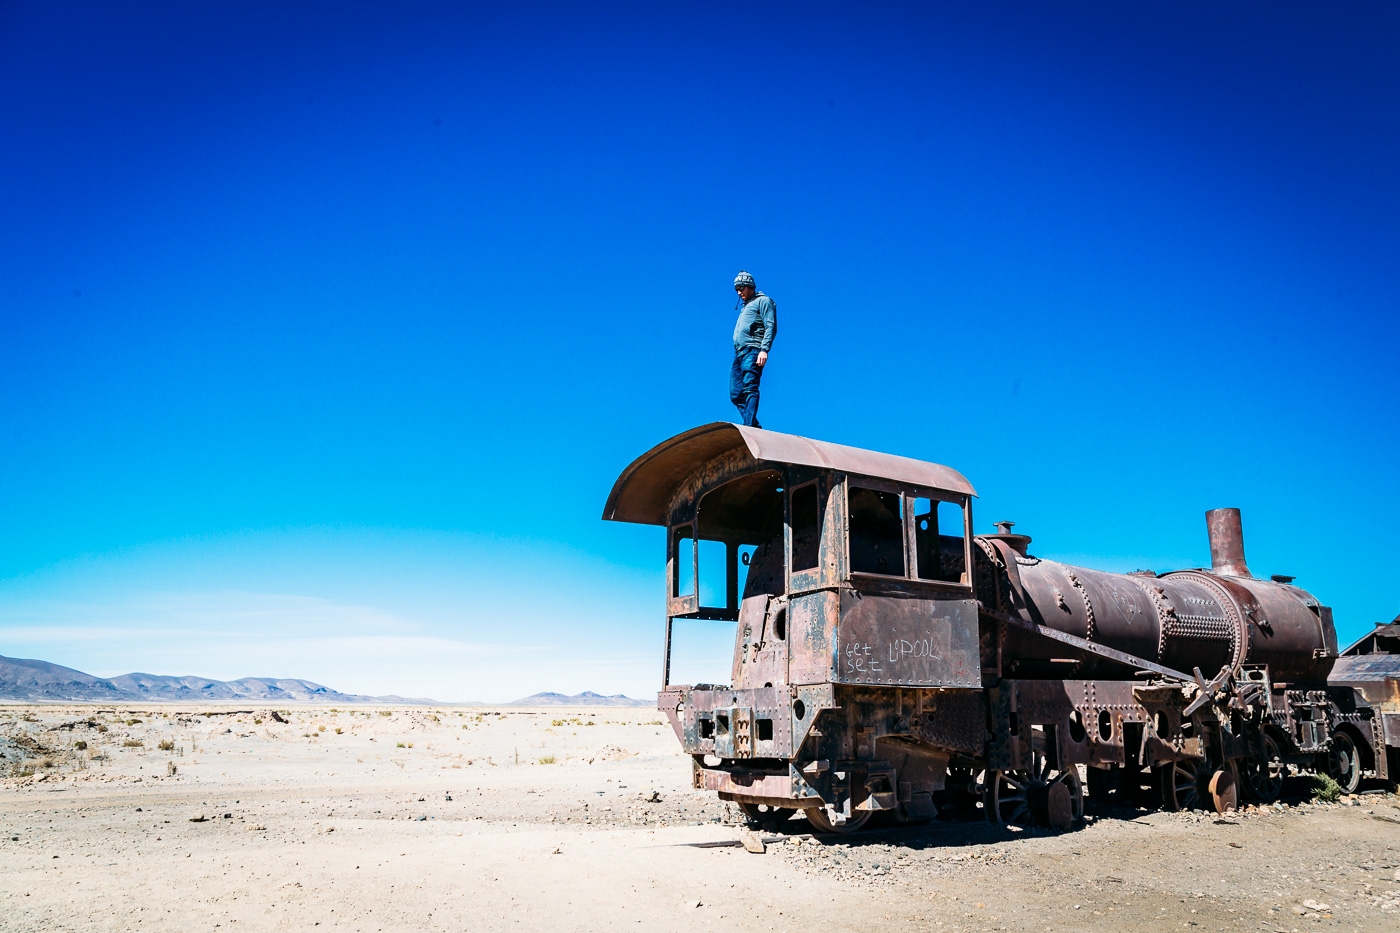 Railroad Cemetary, Salar de Uyuni, Bolivia July 2015